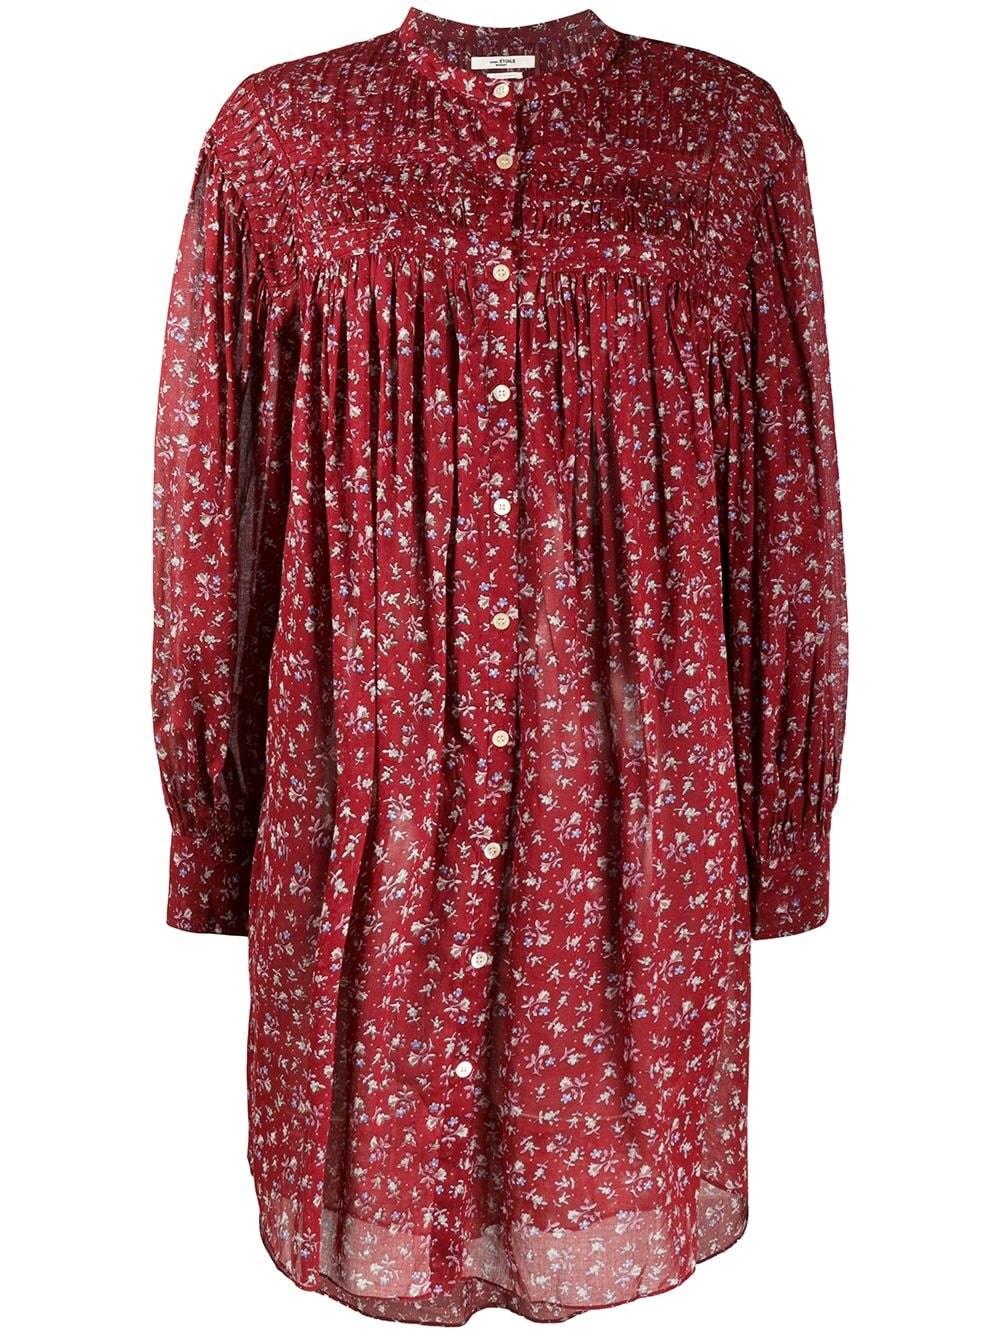 ISABEL MARANT ETOILE Cotton Voile Shirt Dress